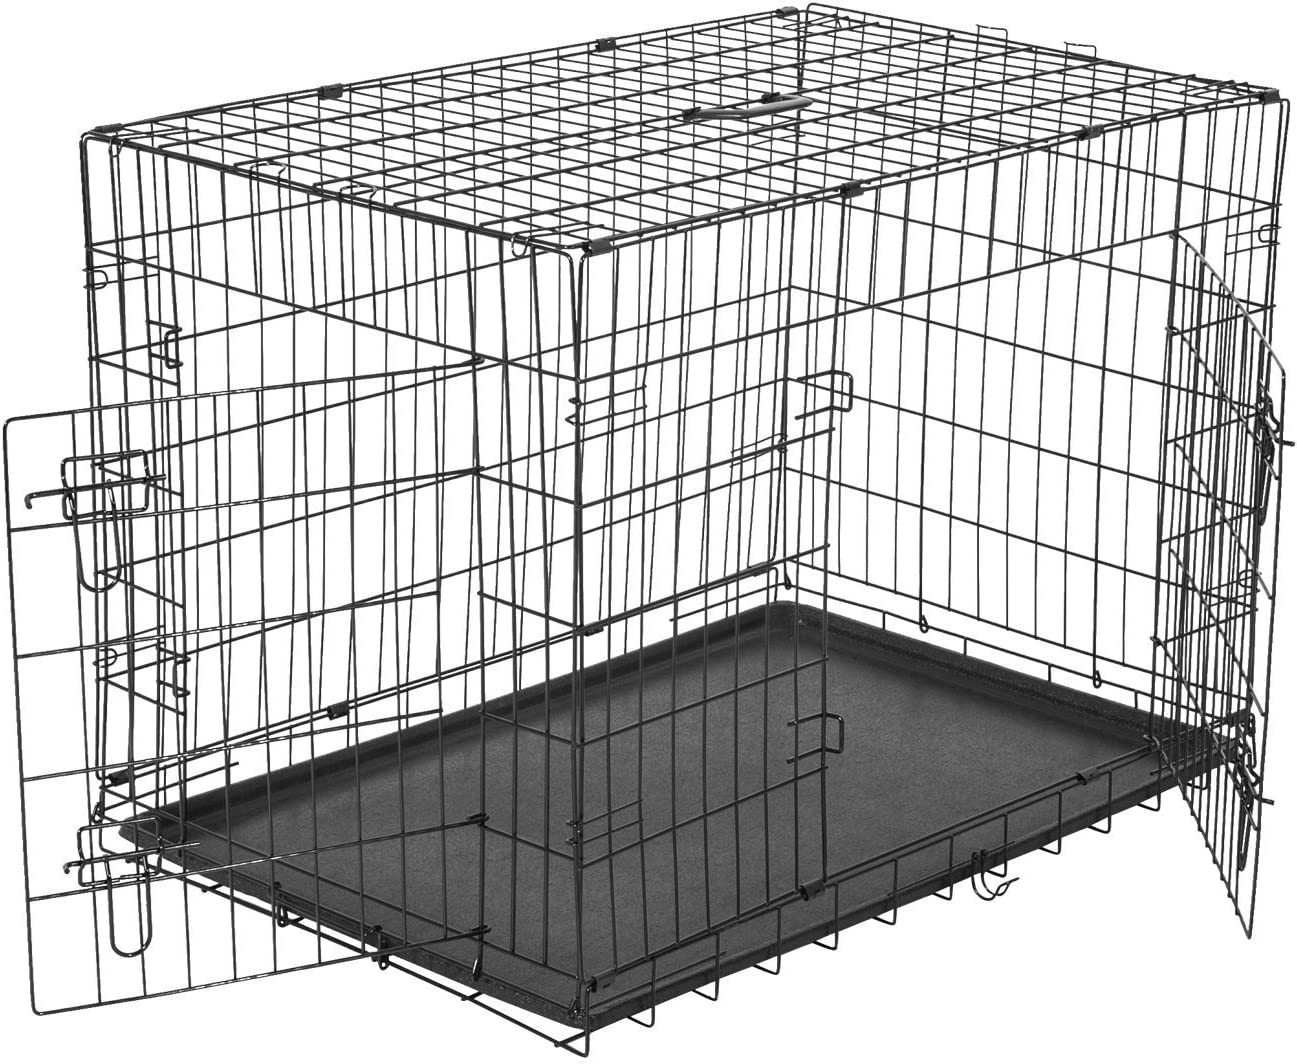 Transportin Perros 91x61x67 cm 2 Puertas Jaula con Asa Transporte Reja de Alambre de Hierro